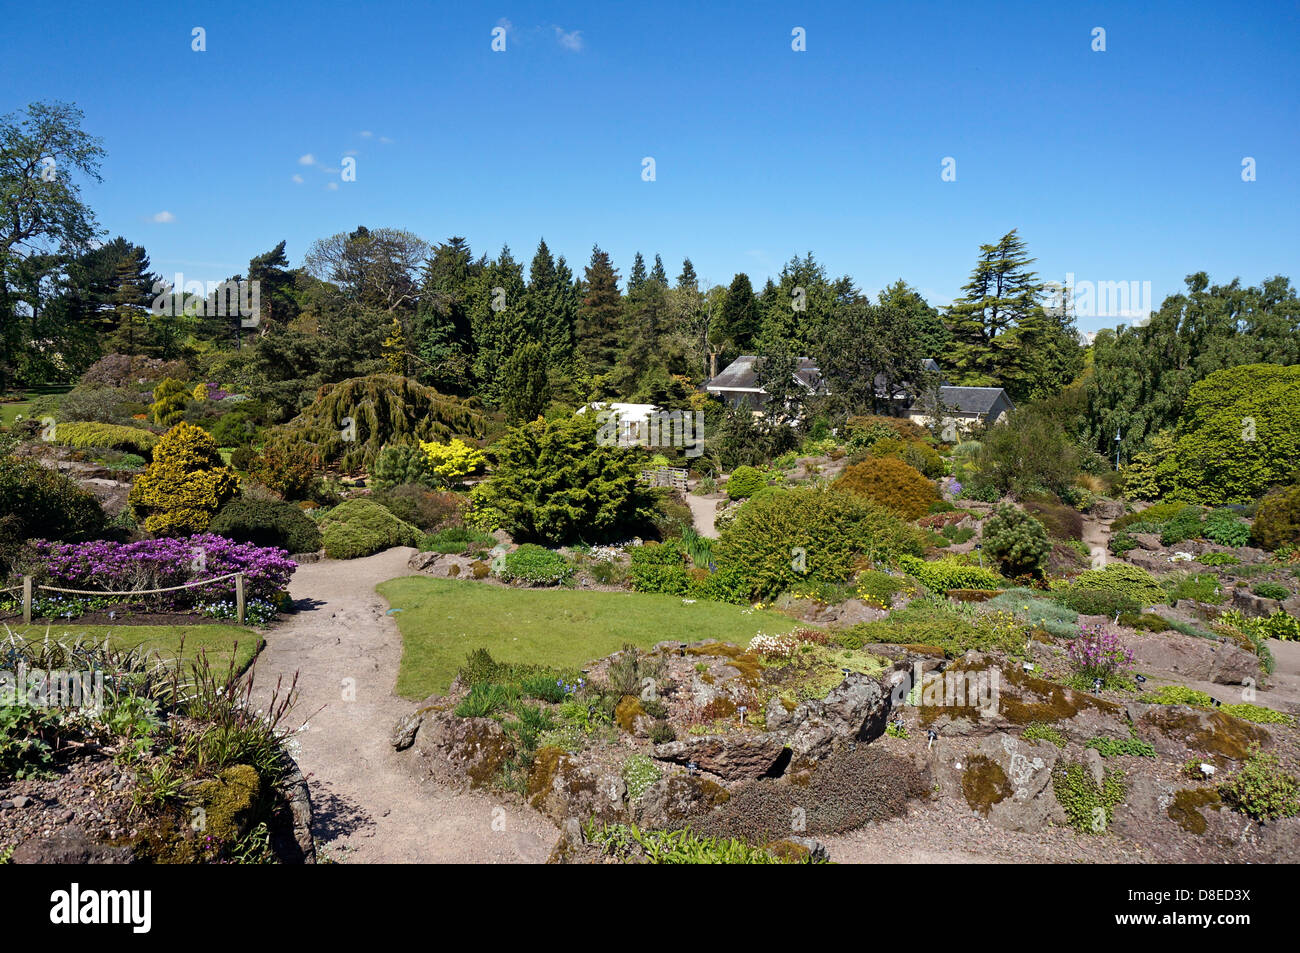 The Rock Garden and stream area of Royal Botanic Garden in Edinburgh Scotland - Stock Image